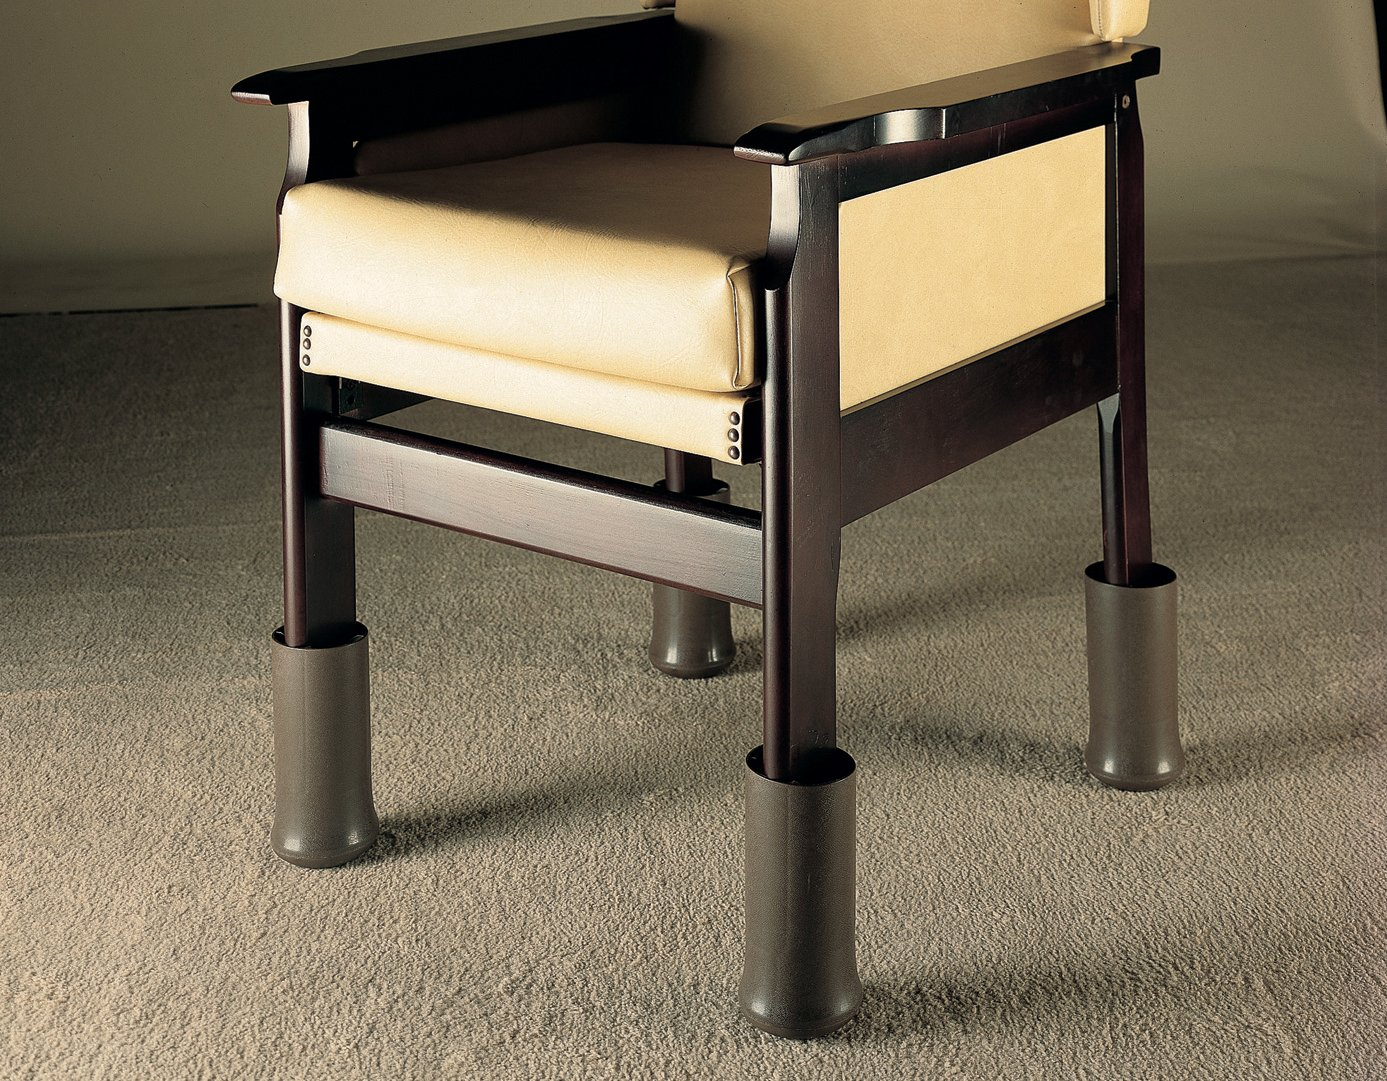 & Amazon.com: Leg-X Chair Raisers (Pack of 4): Health u0026 Personal Care